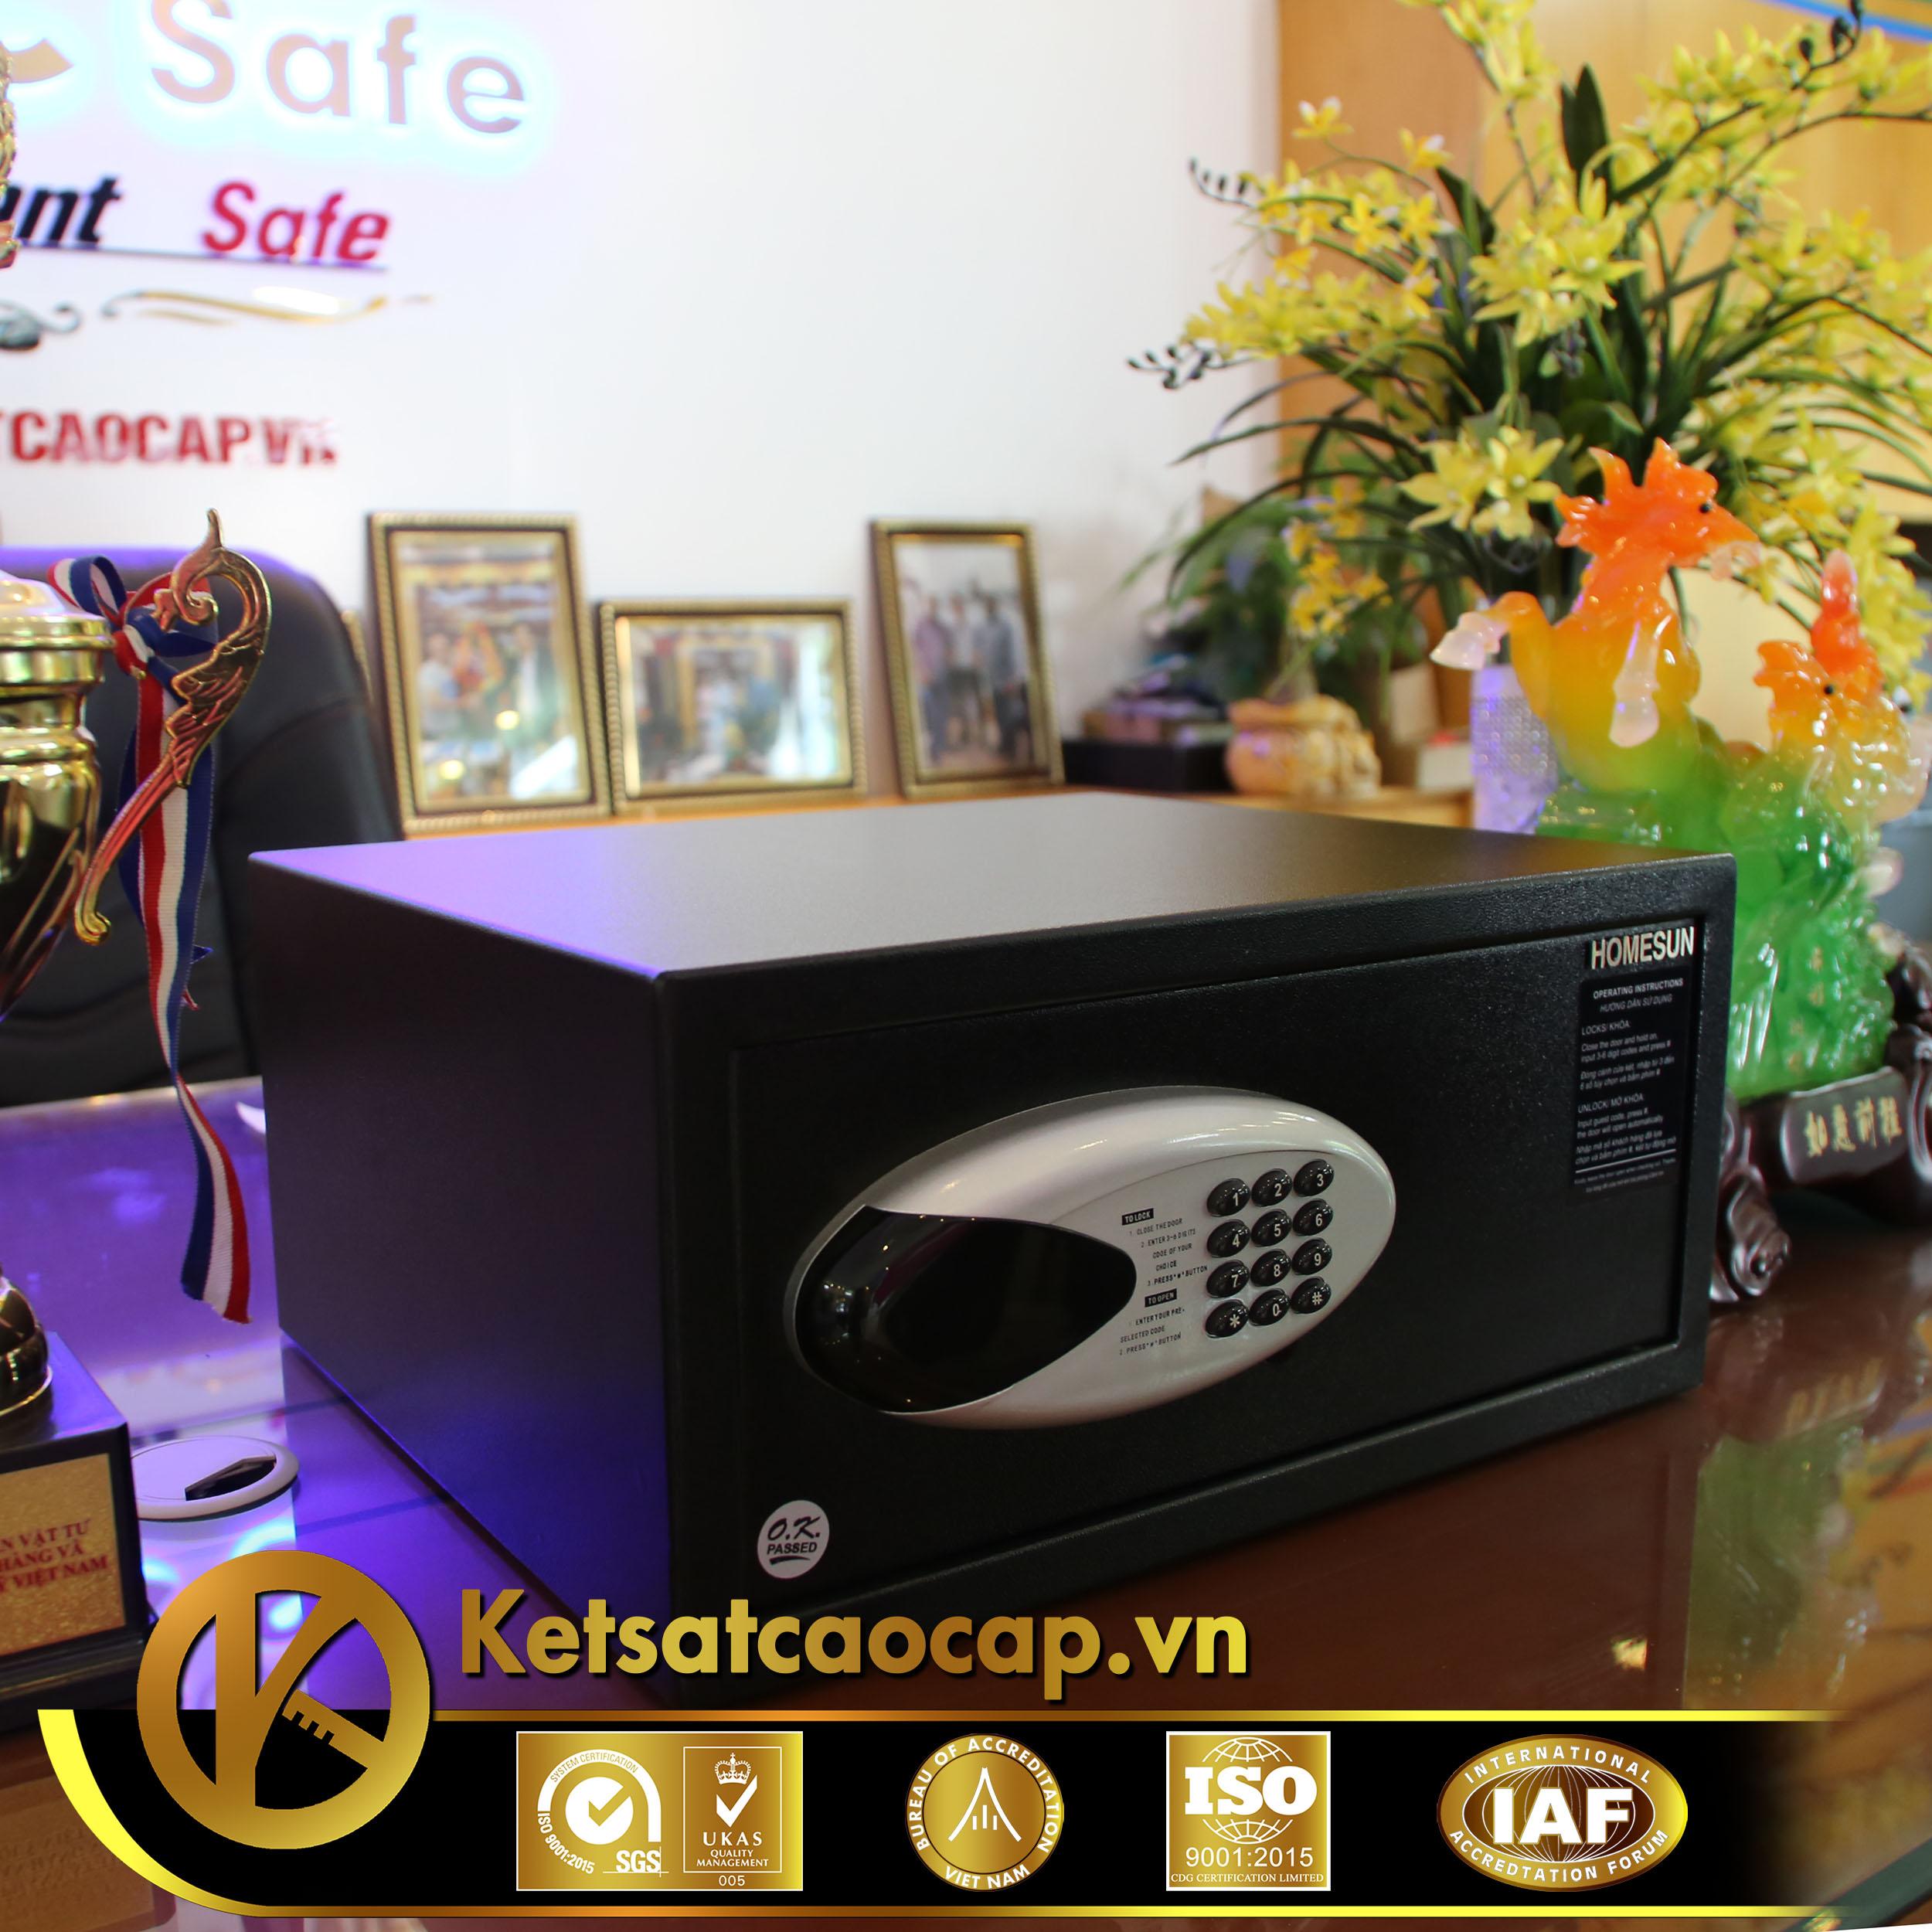 cửa hàng bán Ket Sat Khach San Hotel Safe Tinh Dak Lak